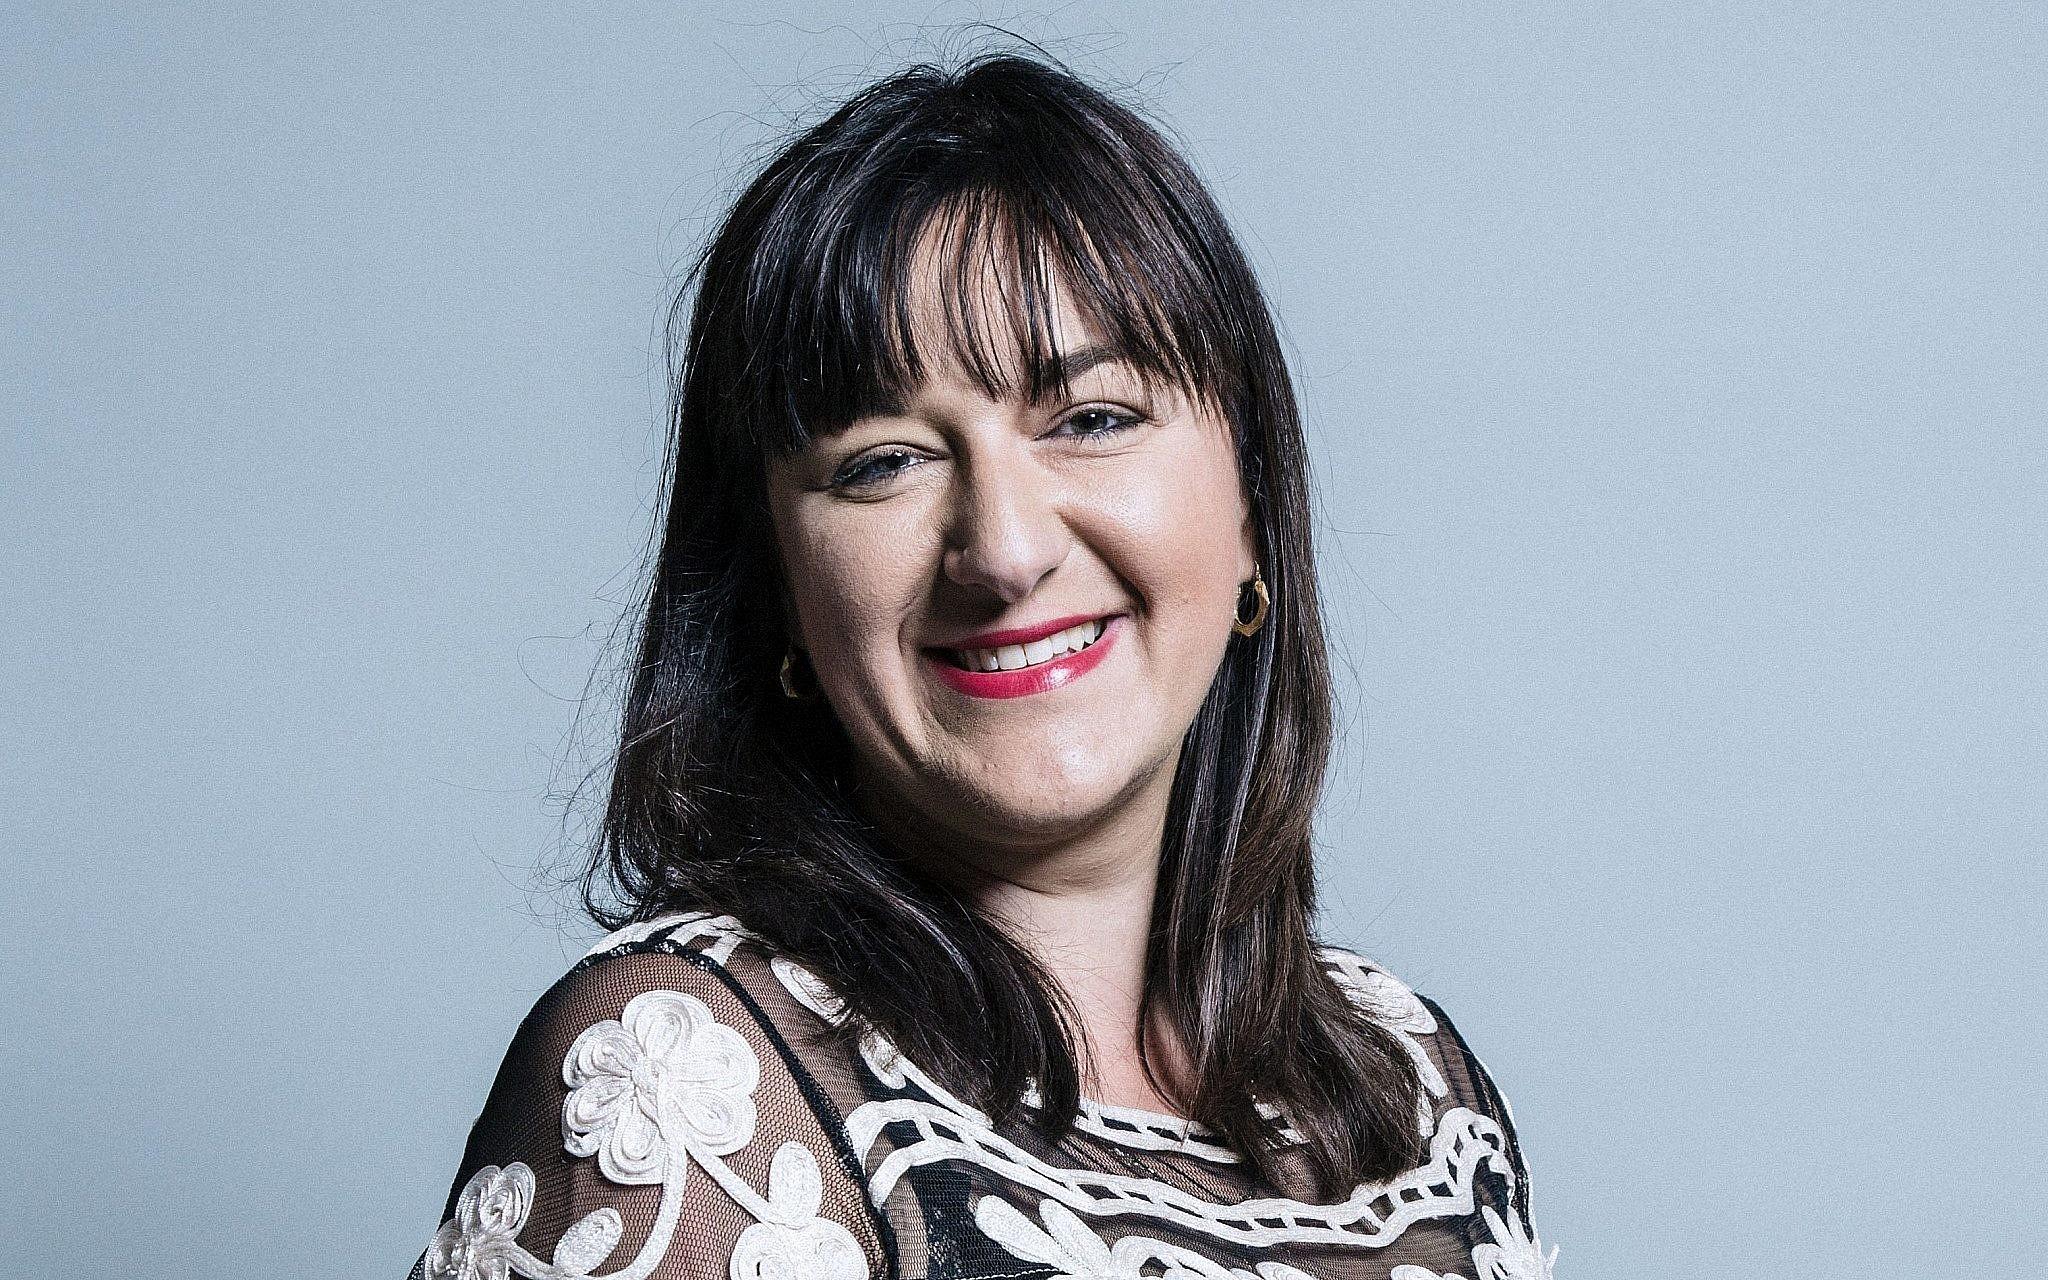 Jewish Labour MP Ruth Smeeth. (UK Parliament)